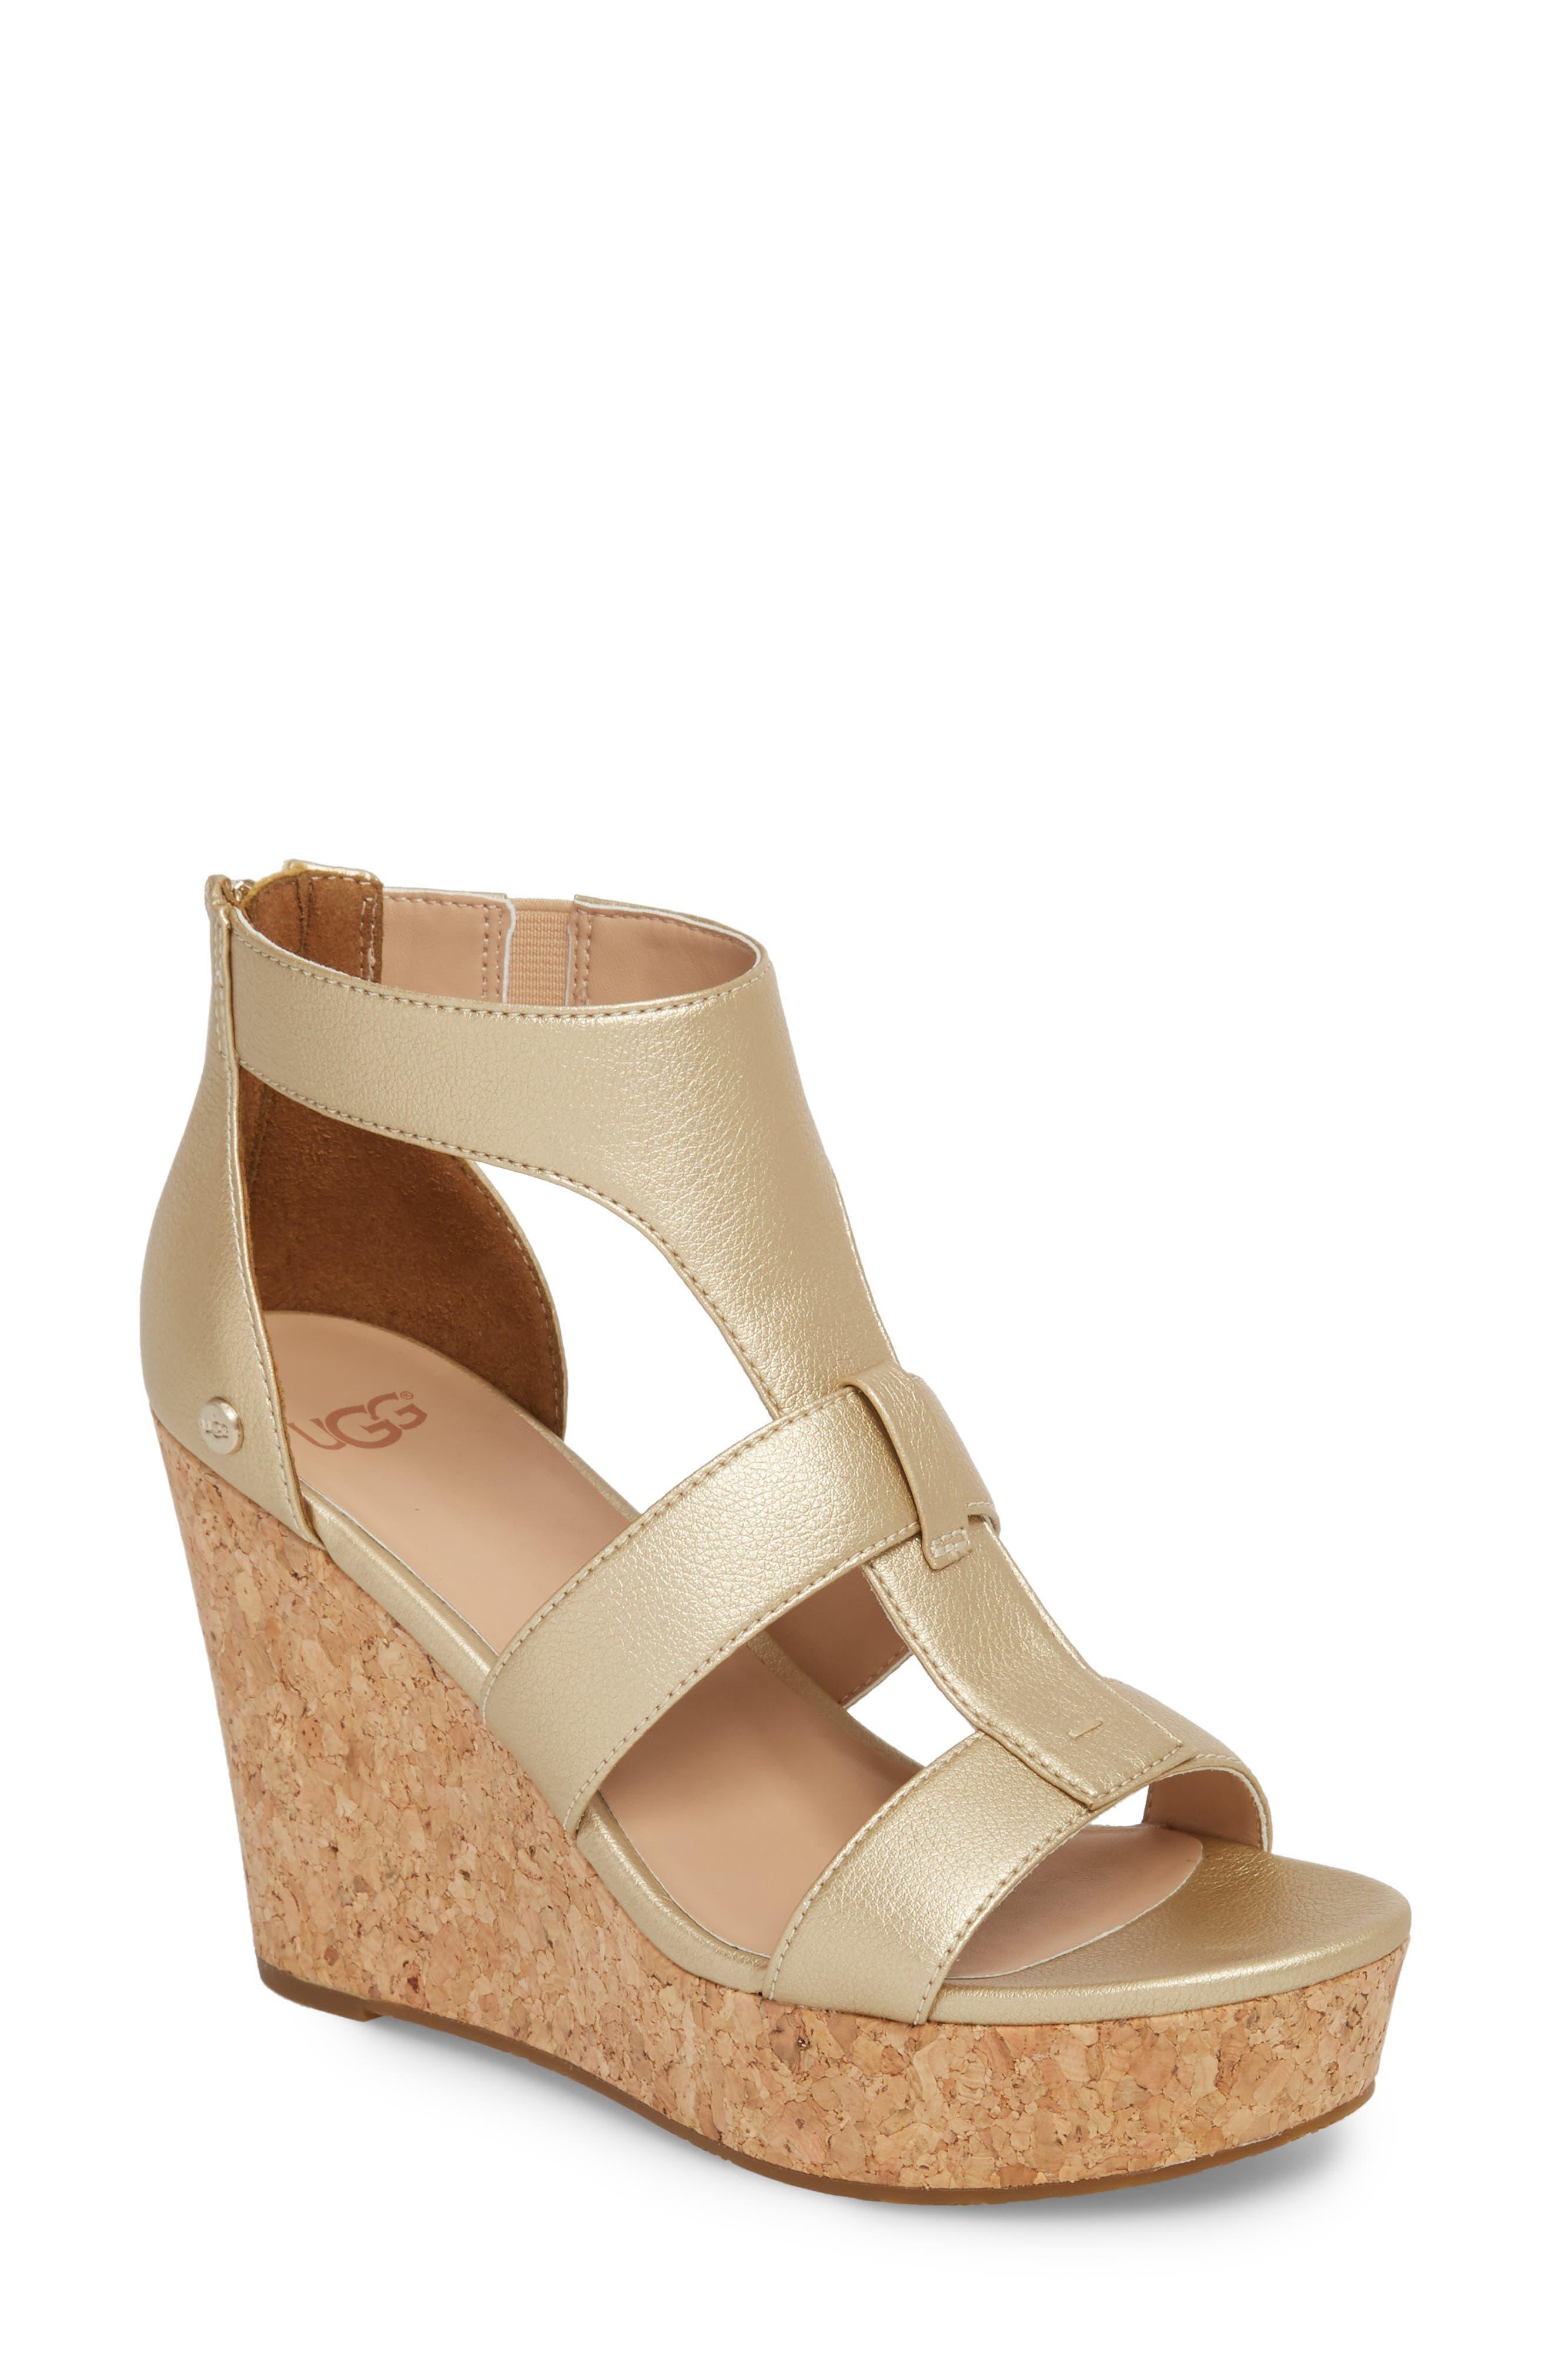 Whitney Platform Wedge Sandal,                         Main,                         color, Gold Leather